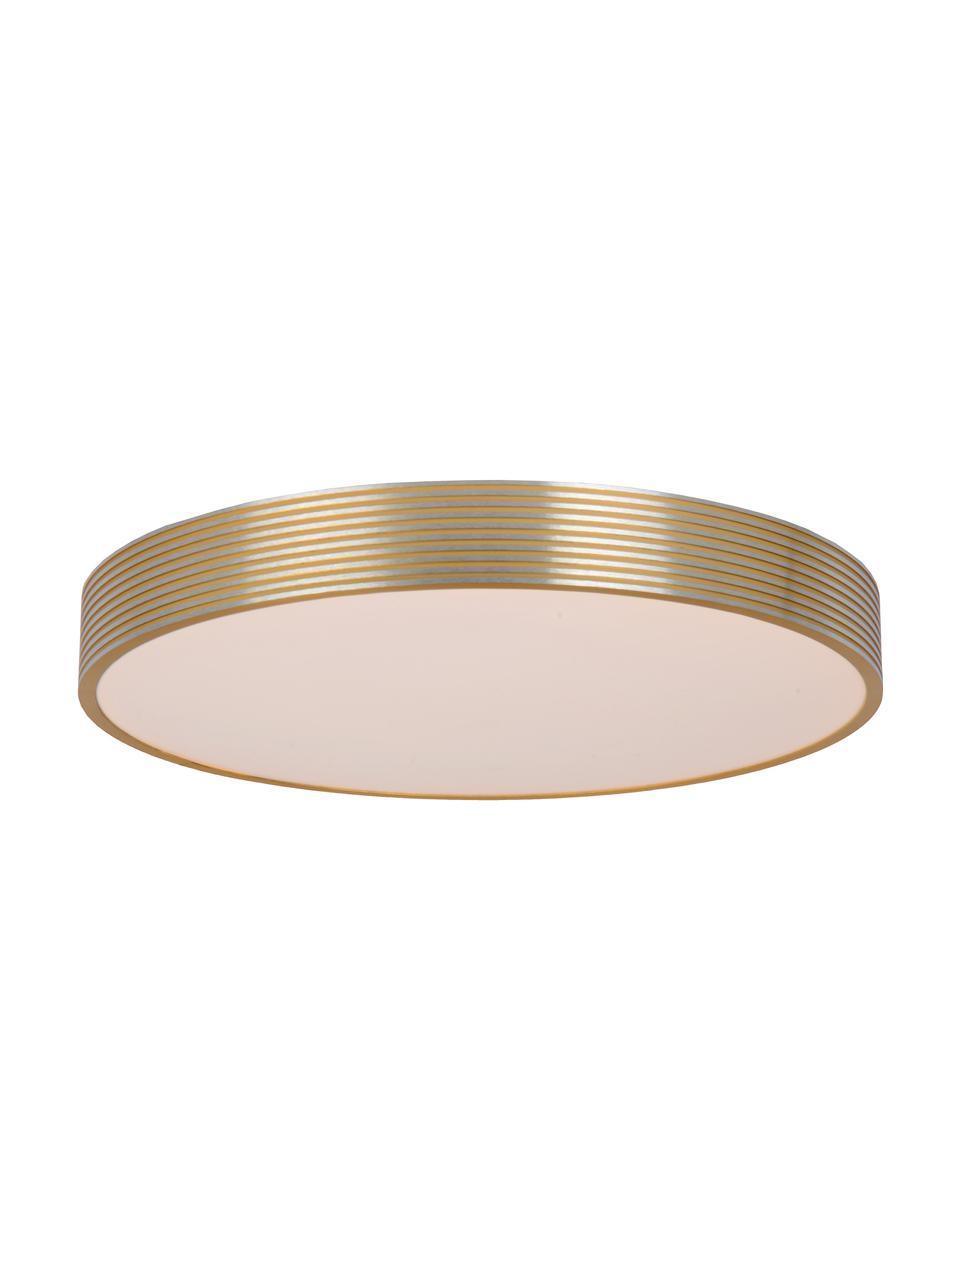 LED-Deckenleuchte Malin aus Metall, Lampenschirm: Metall, Diffusorscheibe: Acryl, Goldfarben, Weiß, Ø 39 x H 7 cm